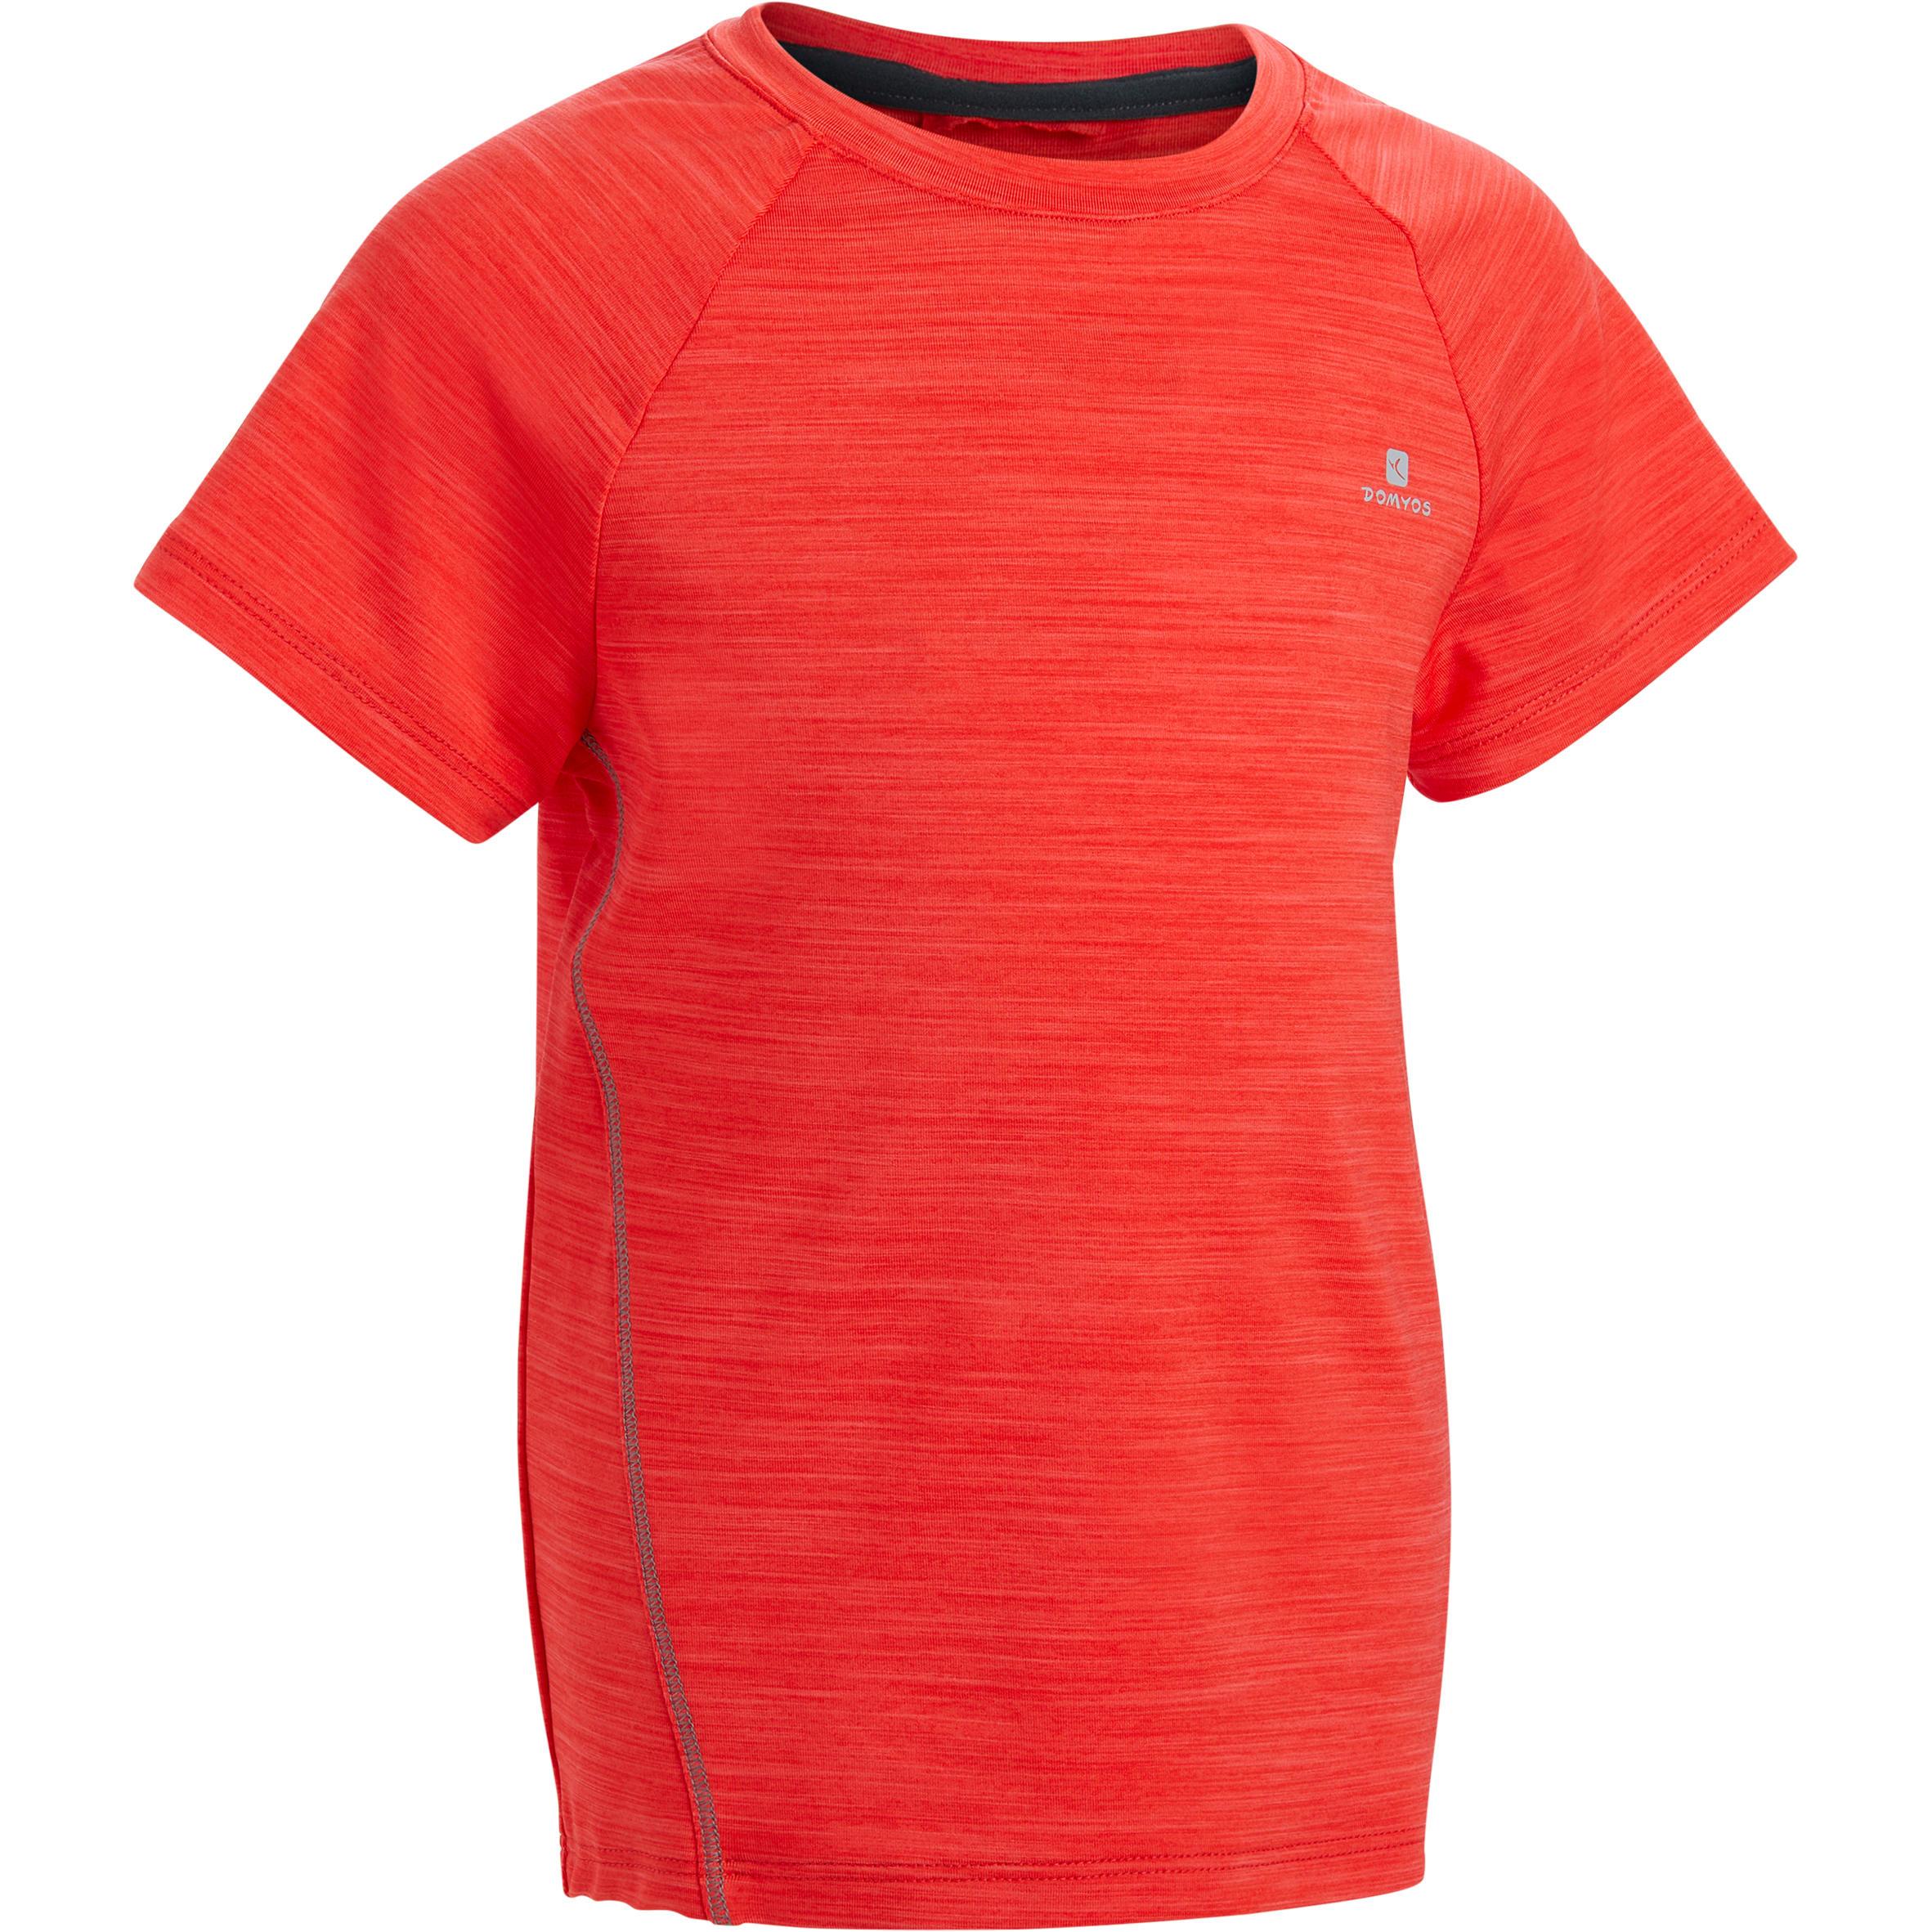 560 Boys' Short Sleeve Gym T-Shirt - Red